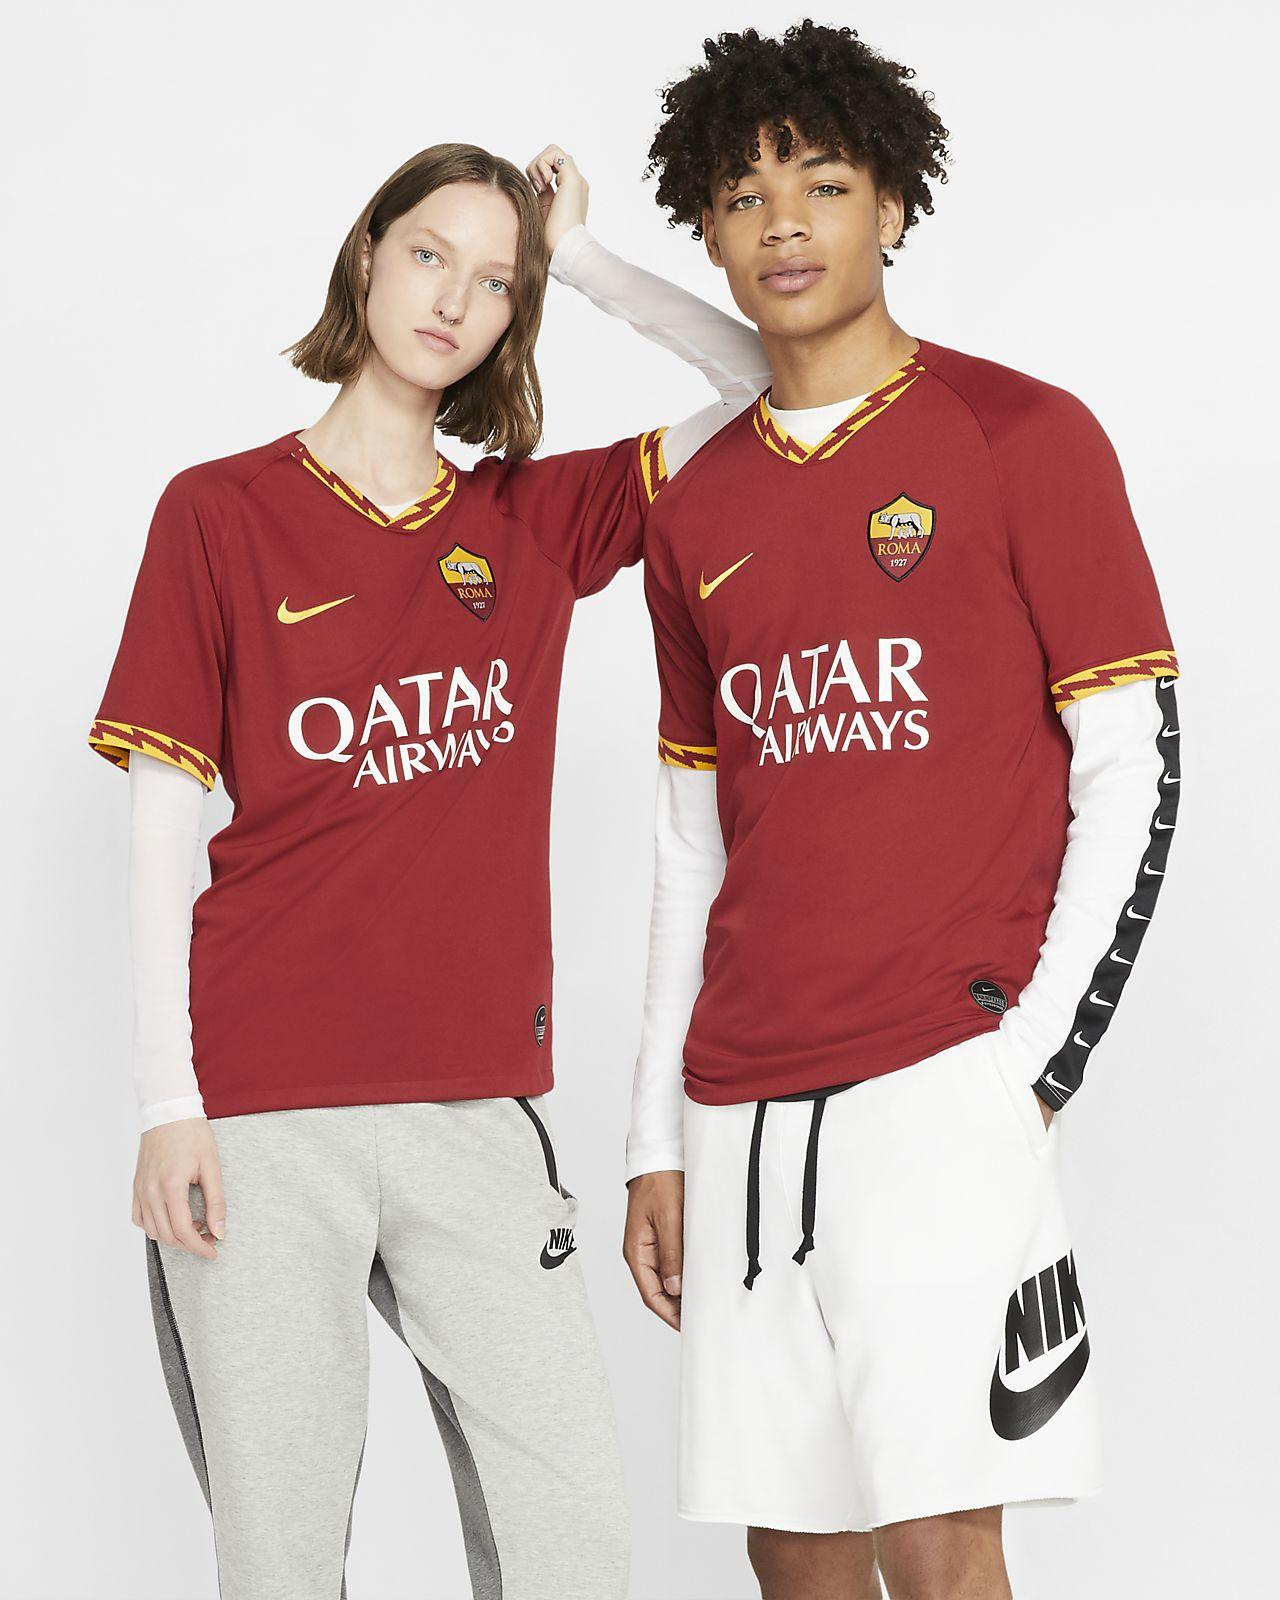 A.S. Roma 2019/20 Stadium Home fotballdrakt